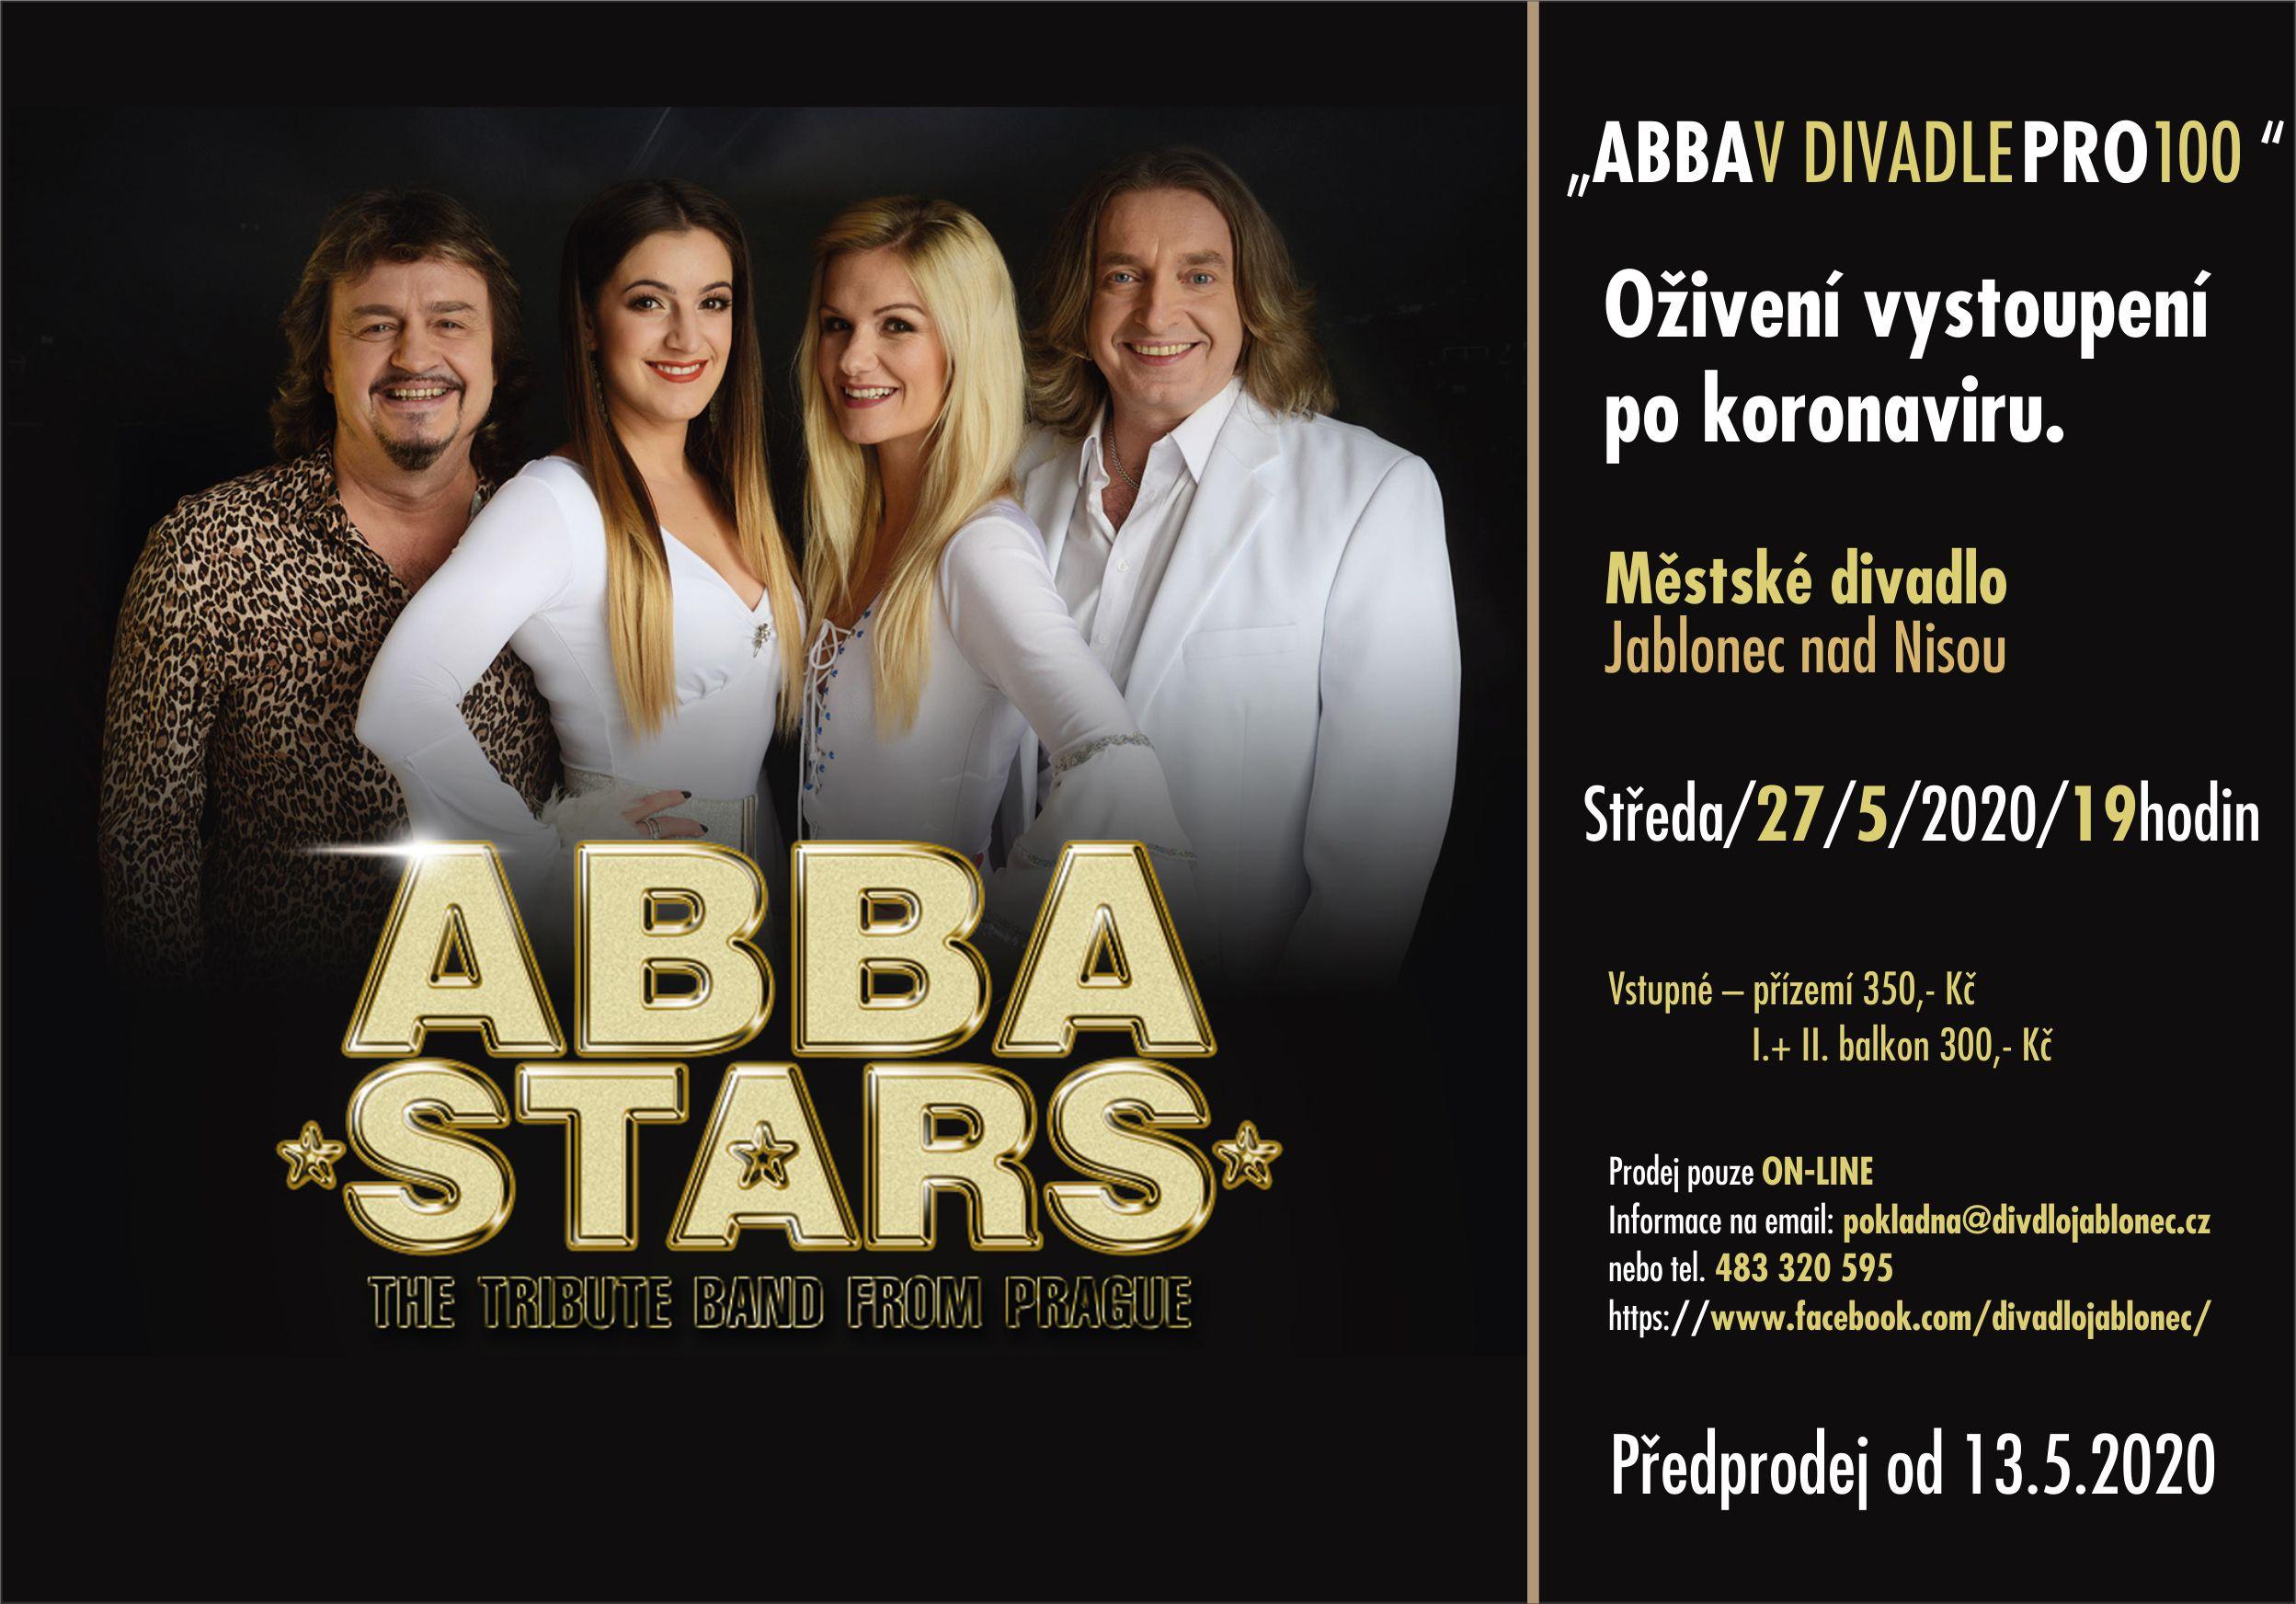 ABBA2020.jpg (415 KB)